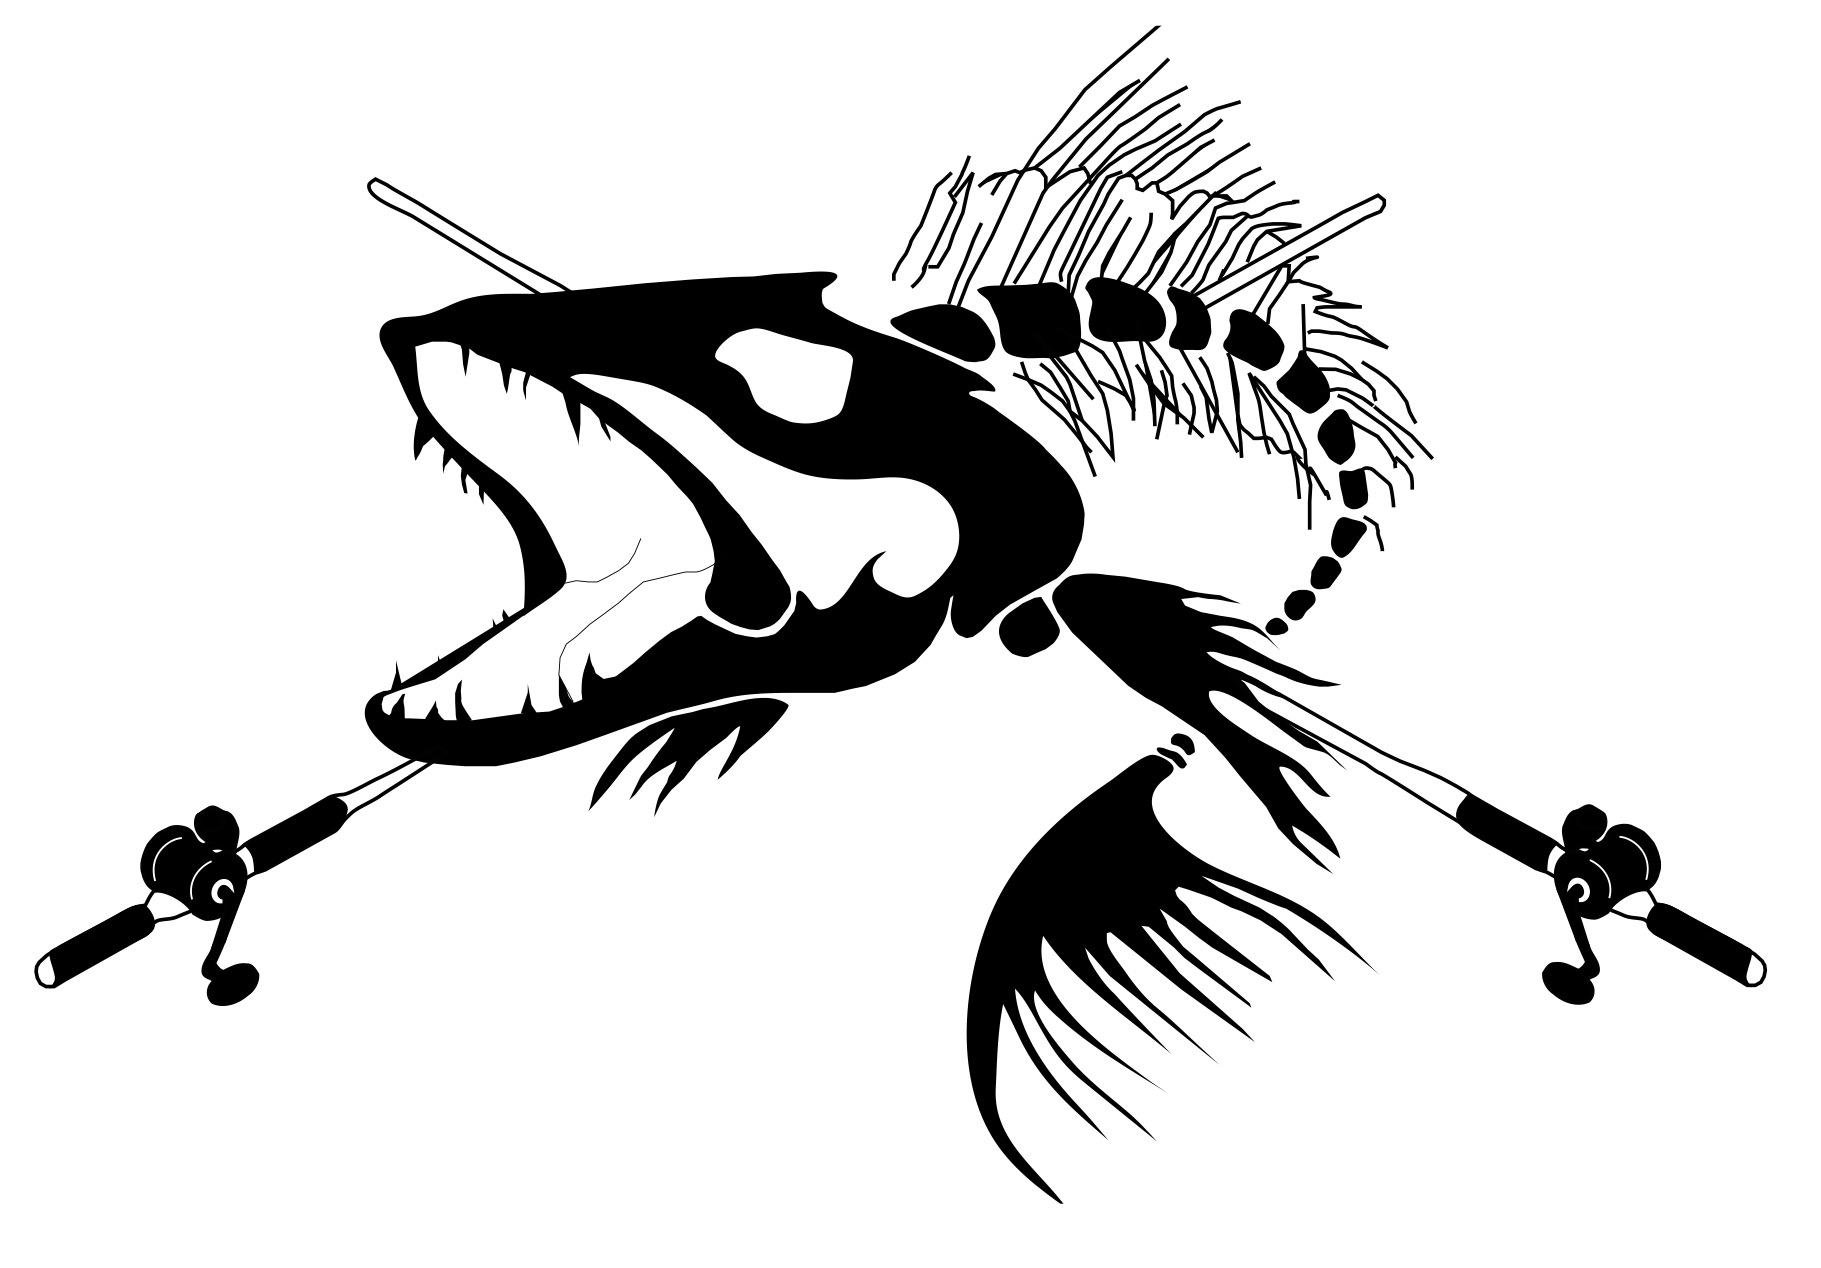 Privateer Sport Fishing Walleye Steelhead And Perch